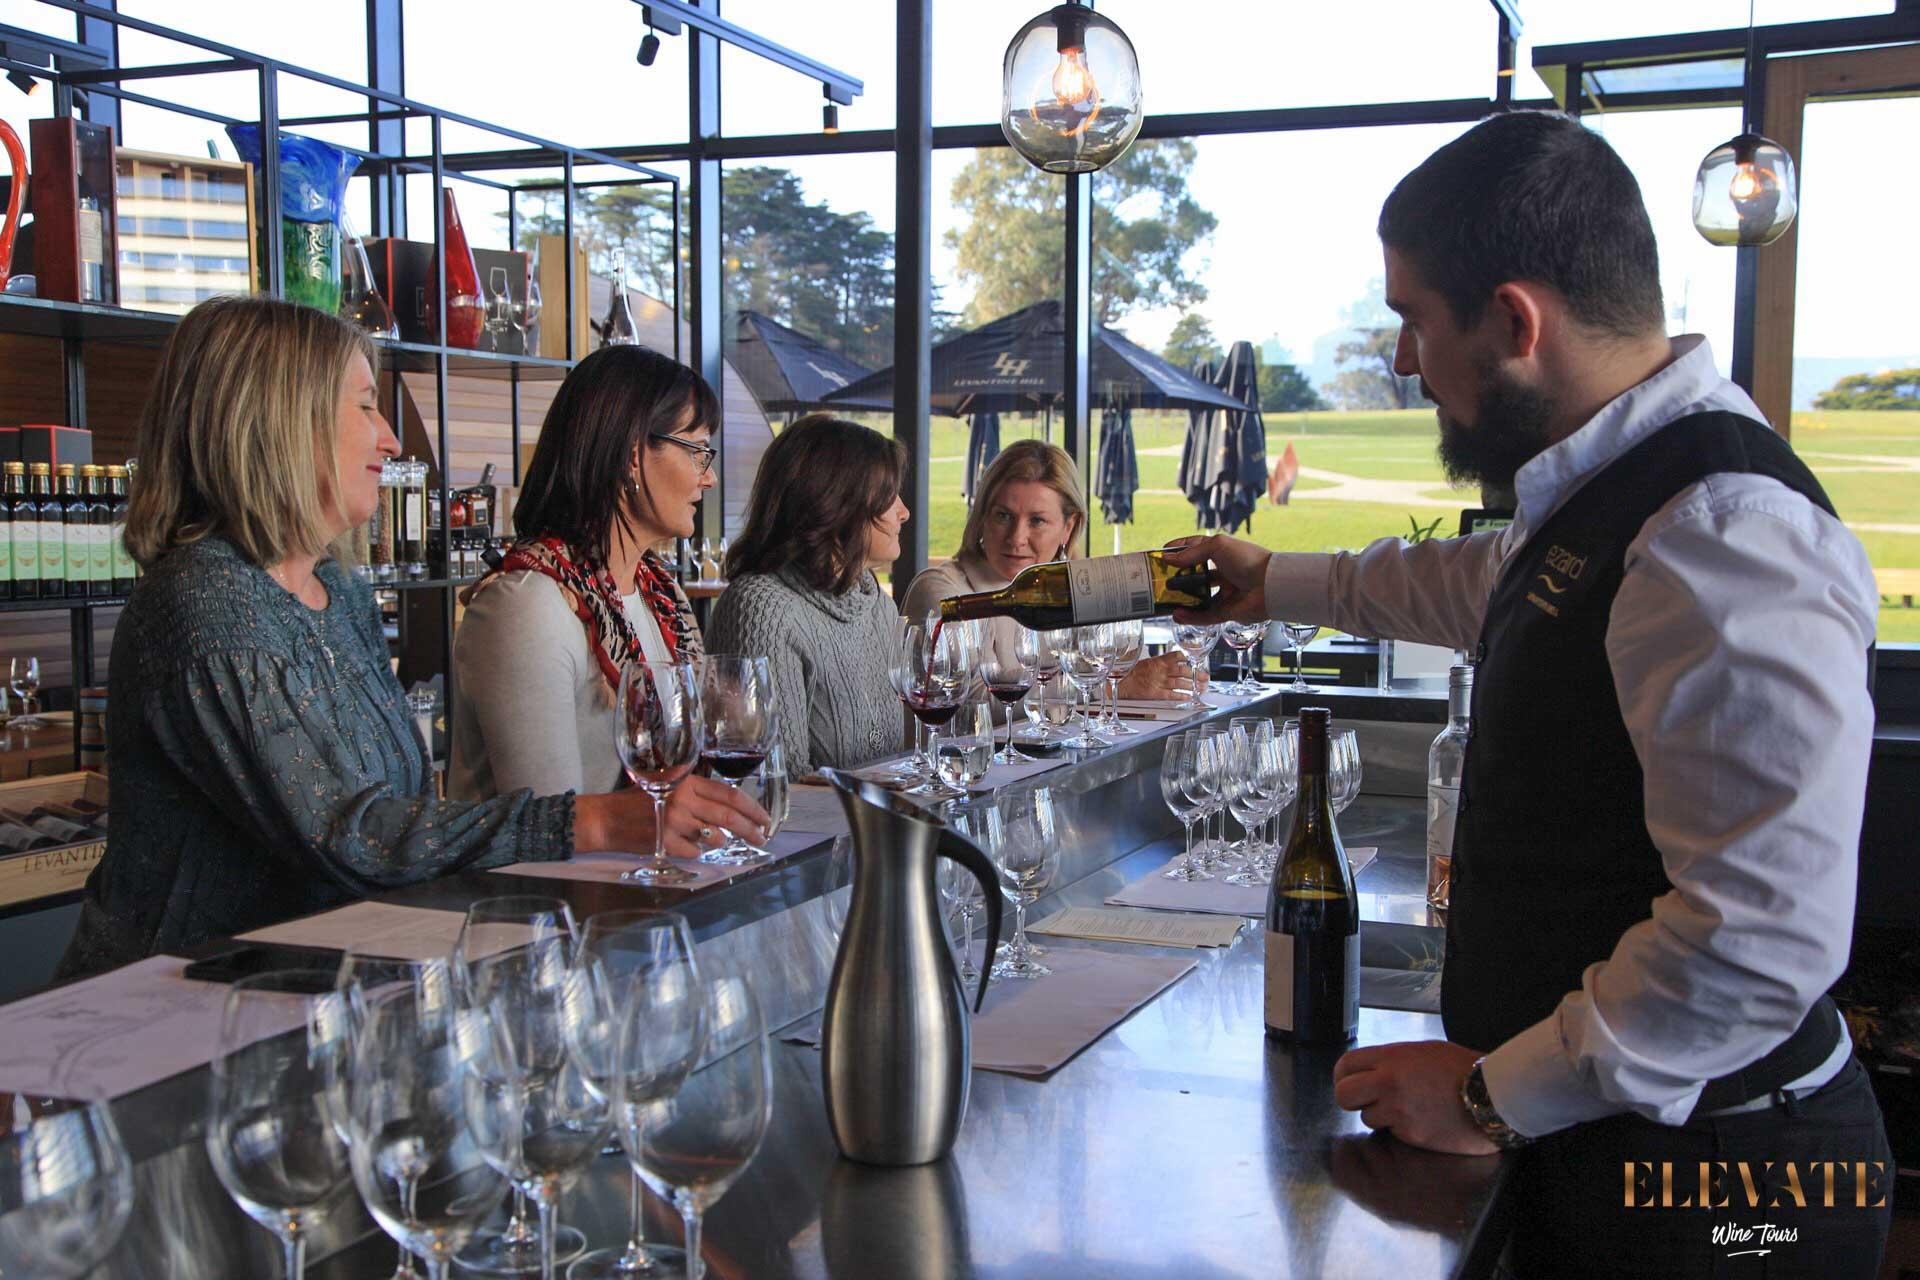 WINE-TASTING-LEVANTINE-HILL-YARRA-VALLEY